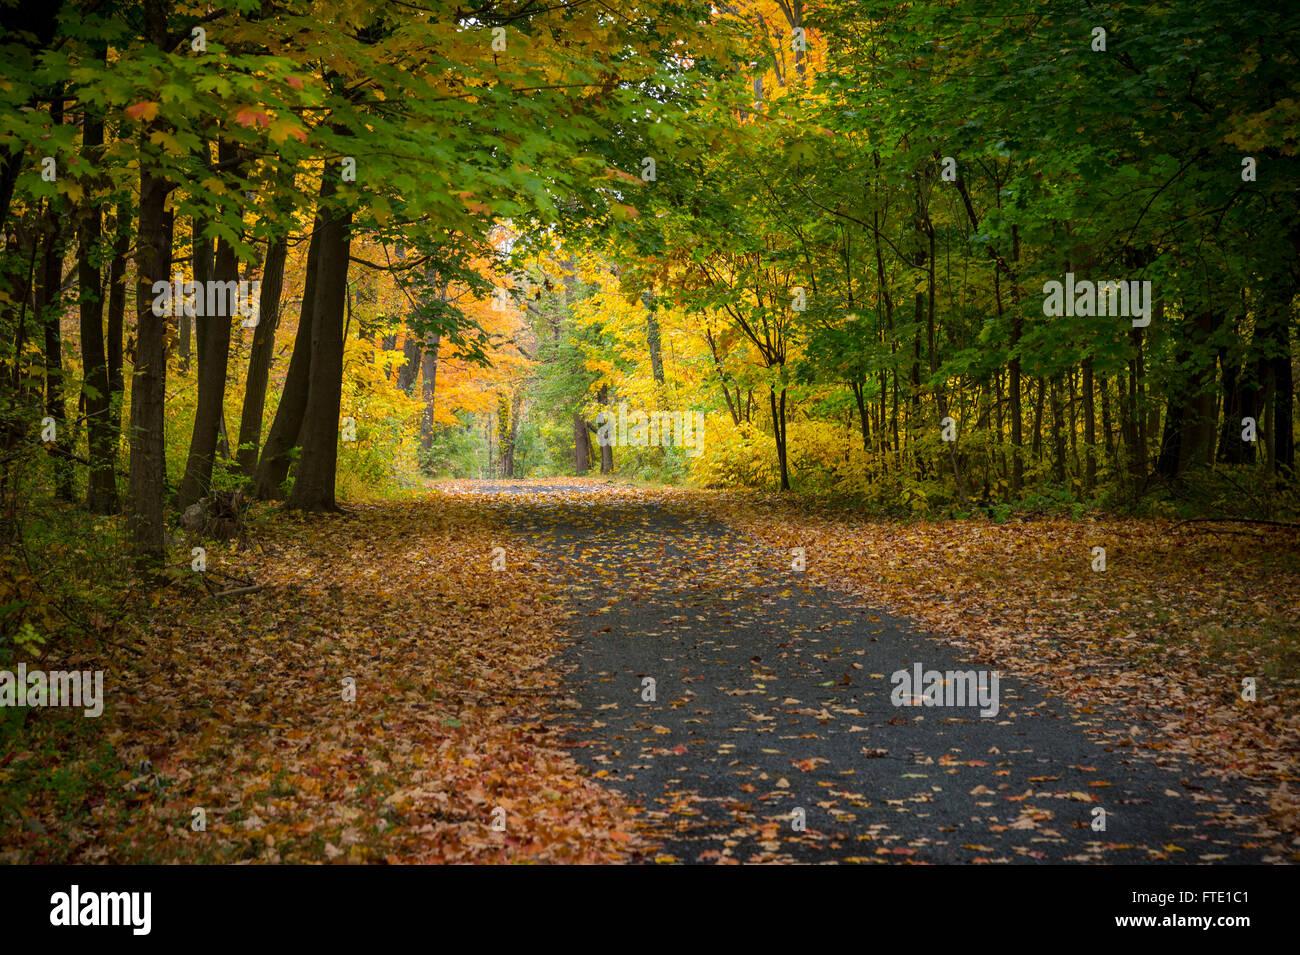 Rural Road With Autumn Trees Fall Foliage, Pennsylvania USA - Stock Image